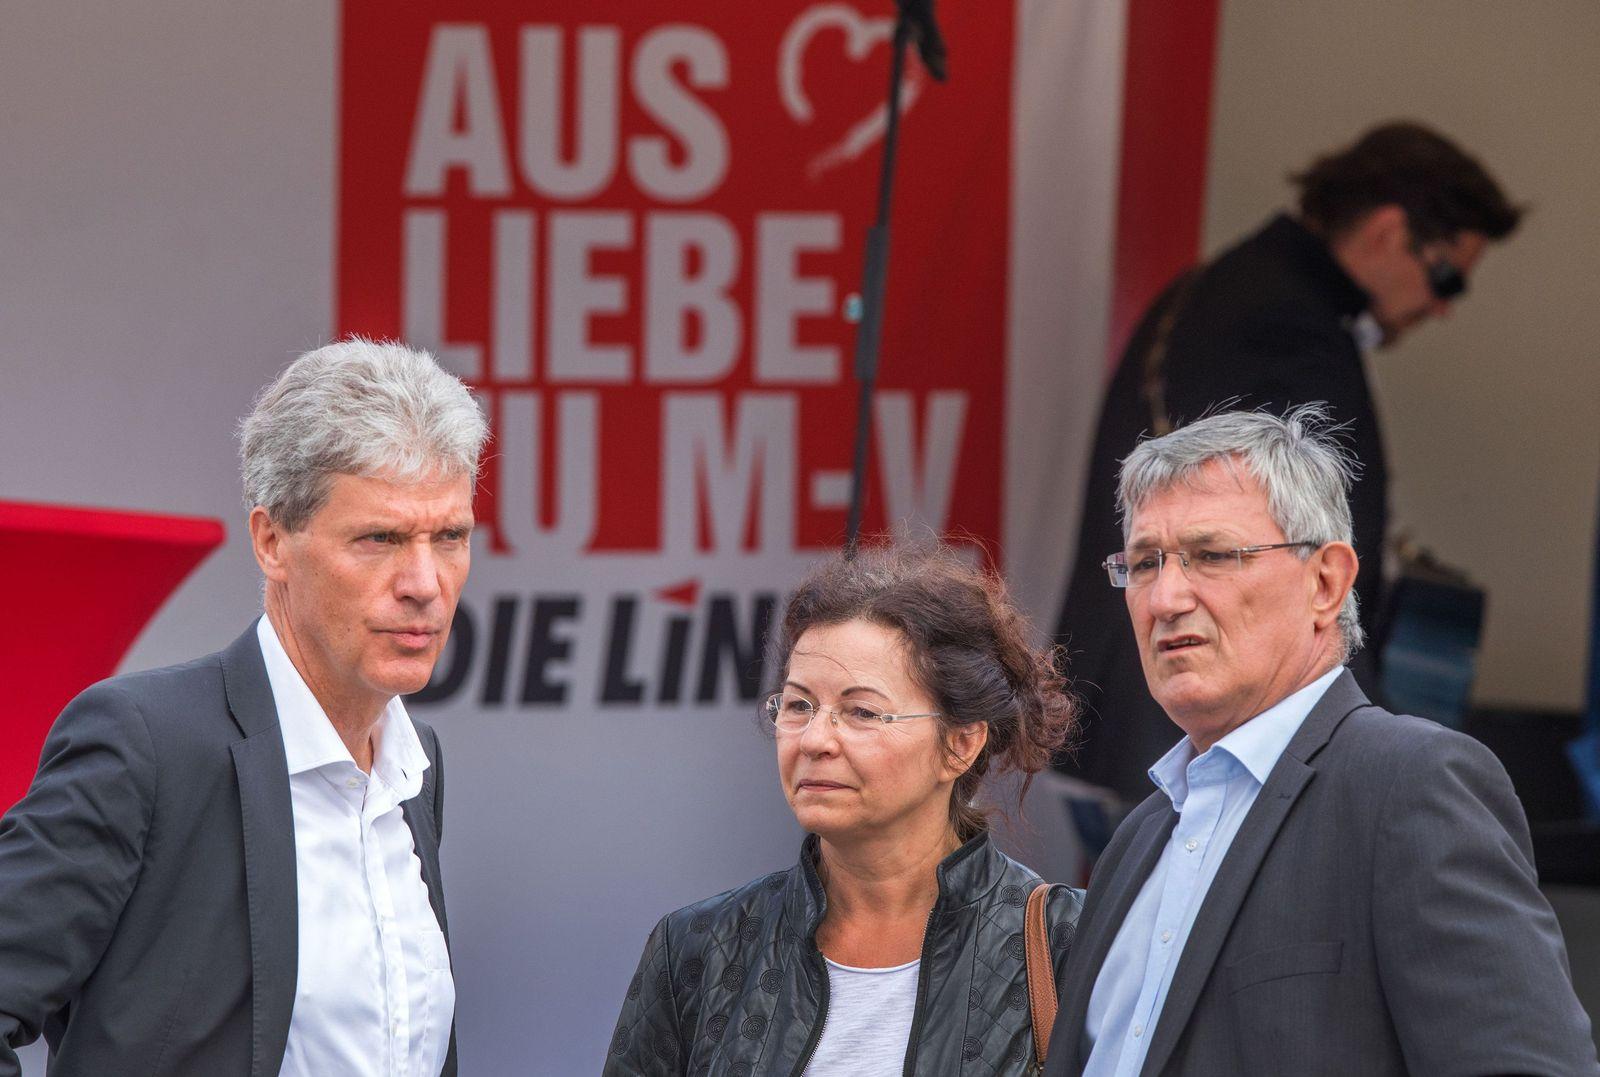 Wahlkampfauftakt Die Linke in Schwerin